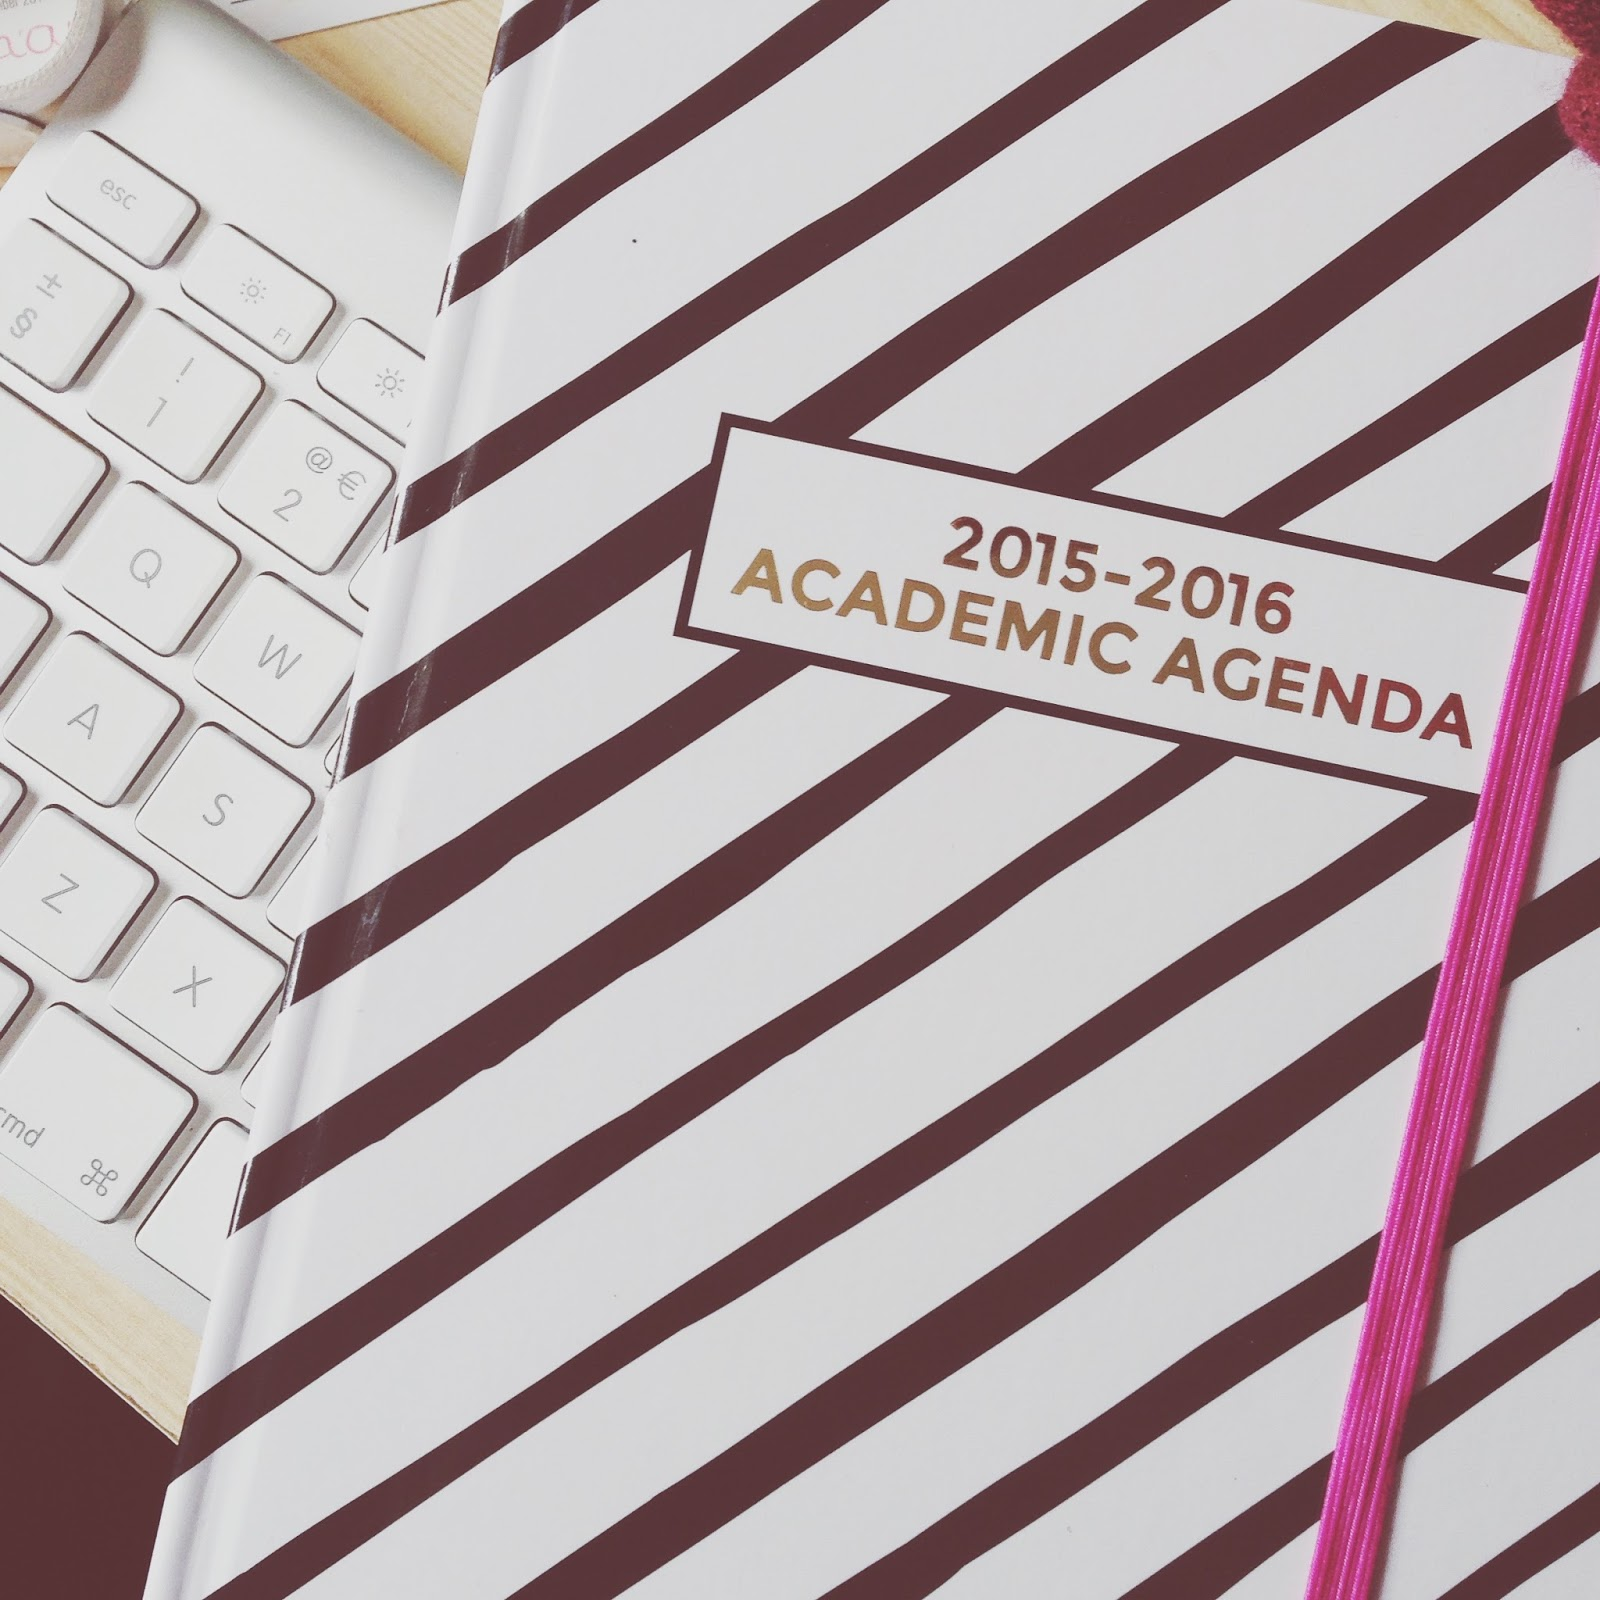 Academic Agenda, Stationery,